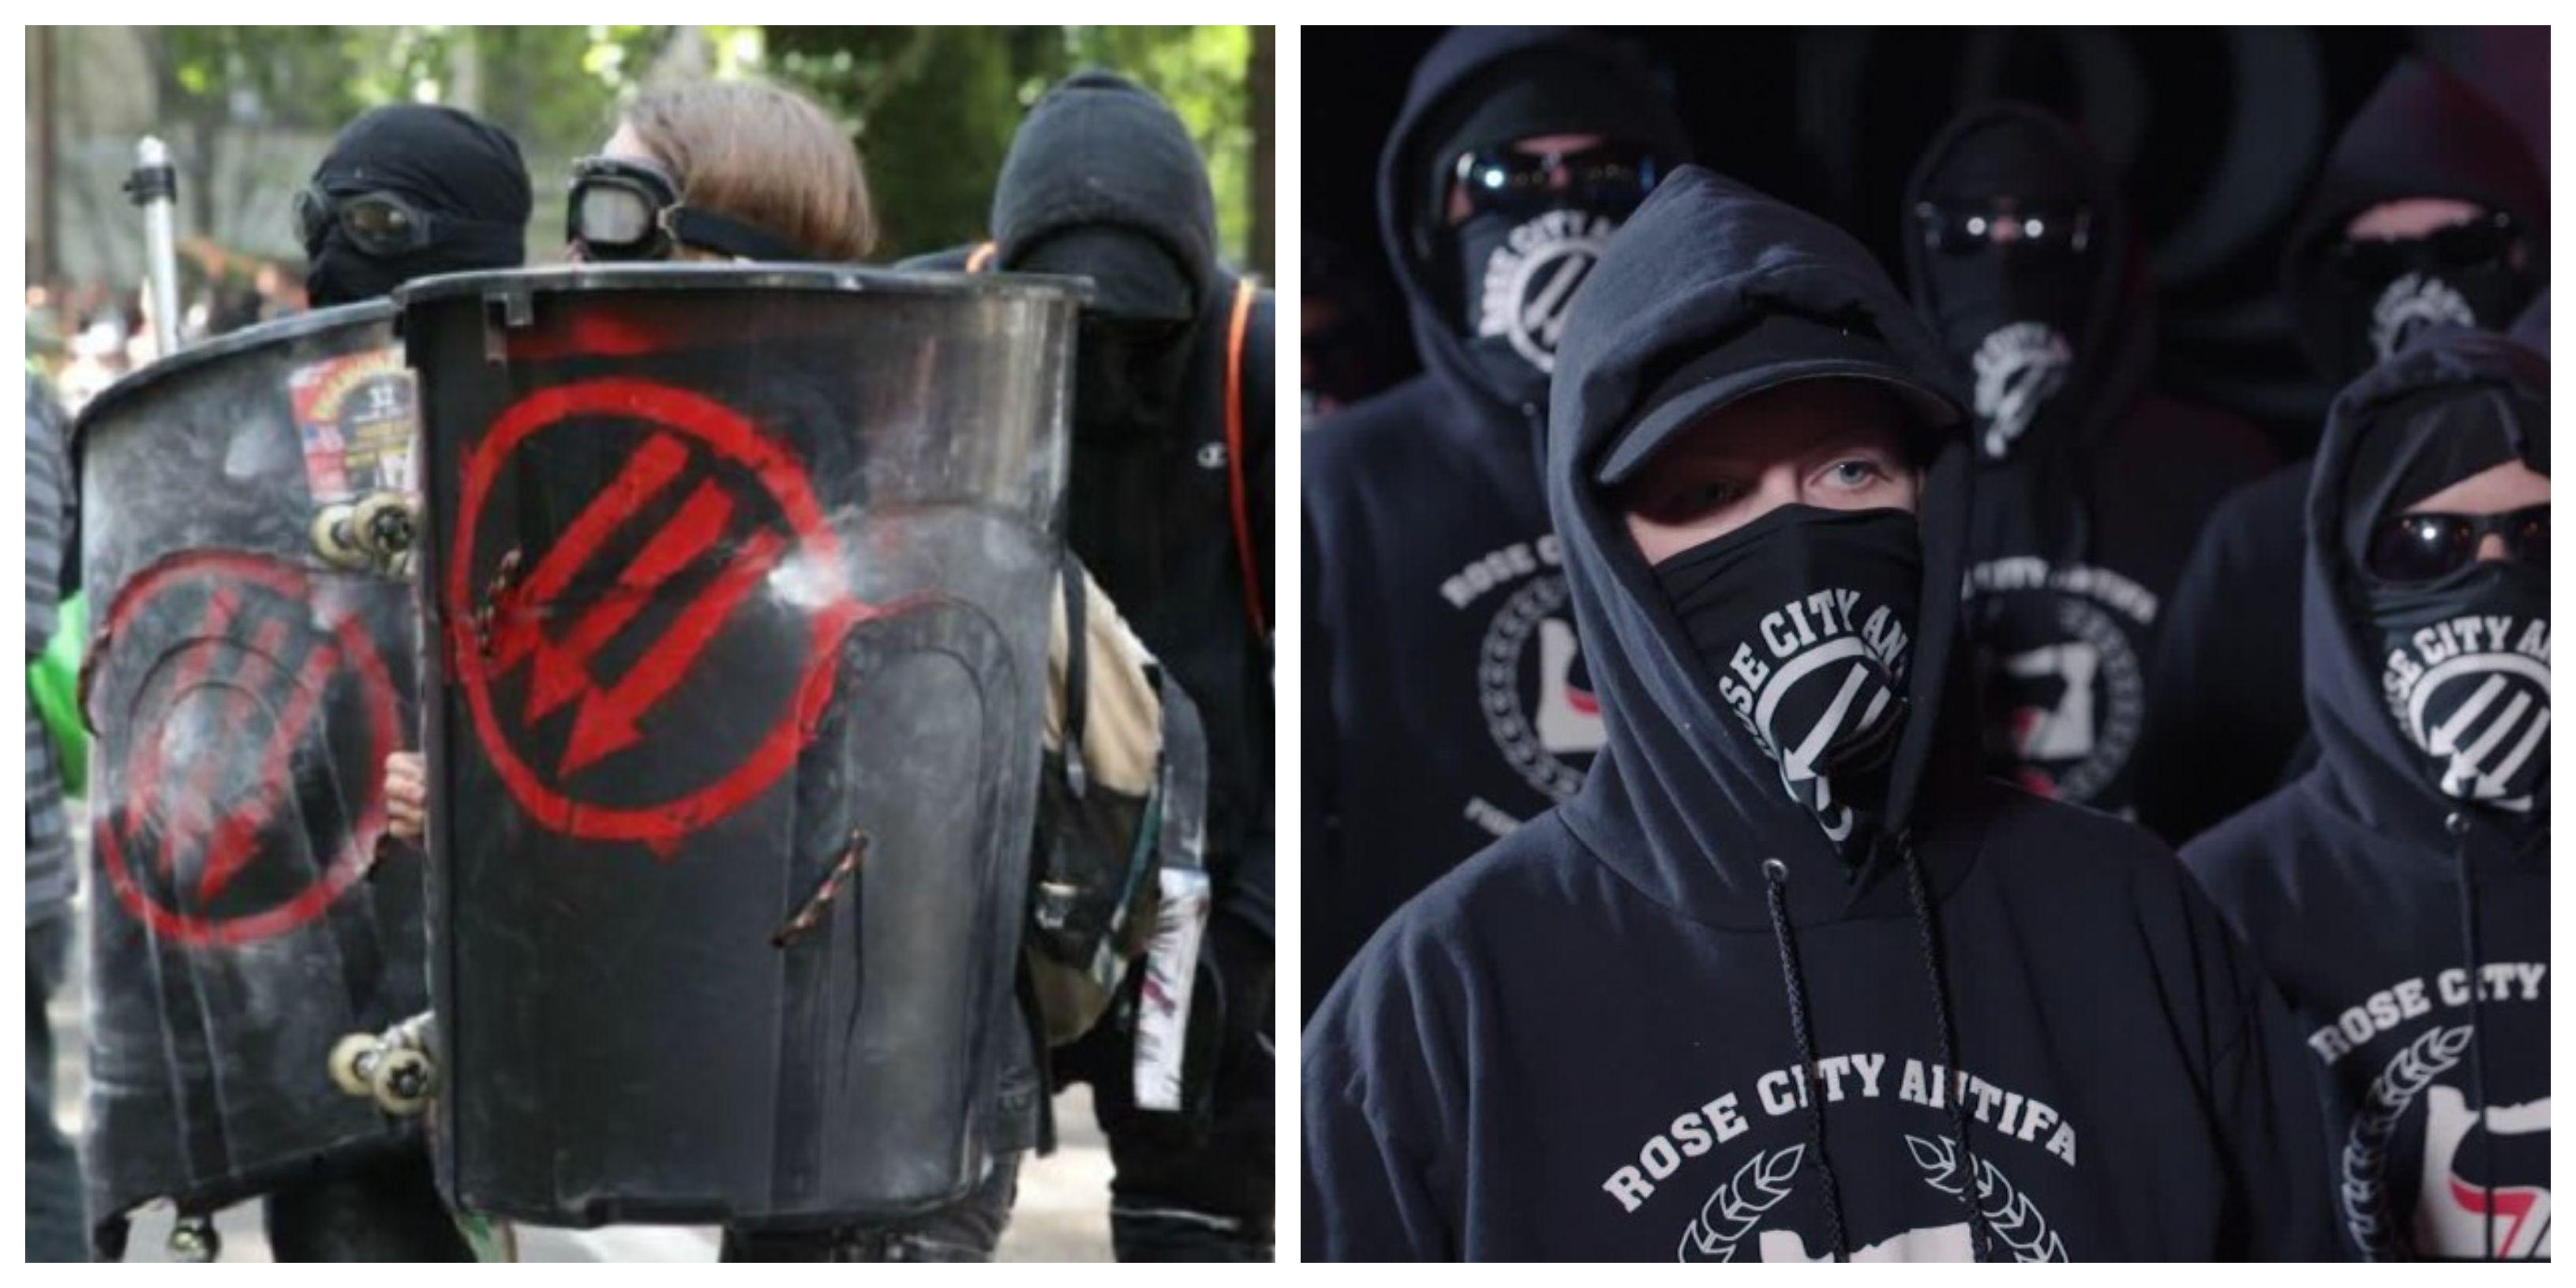 Republican Senators Introduce Bill To Recognize Antifa As Terrorists